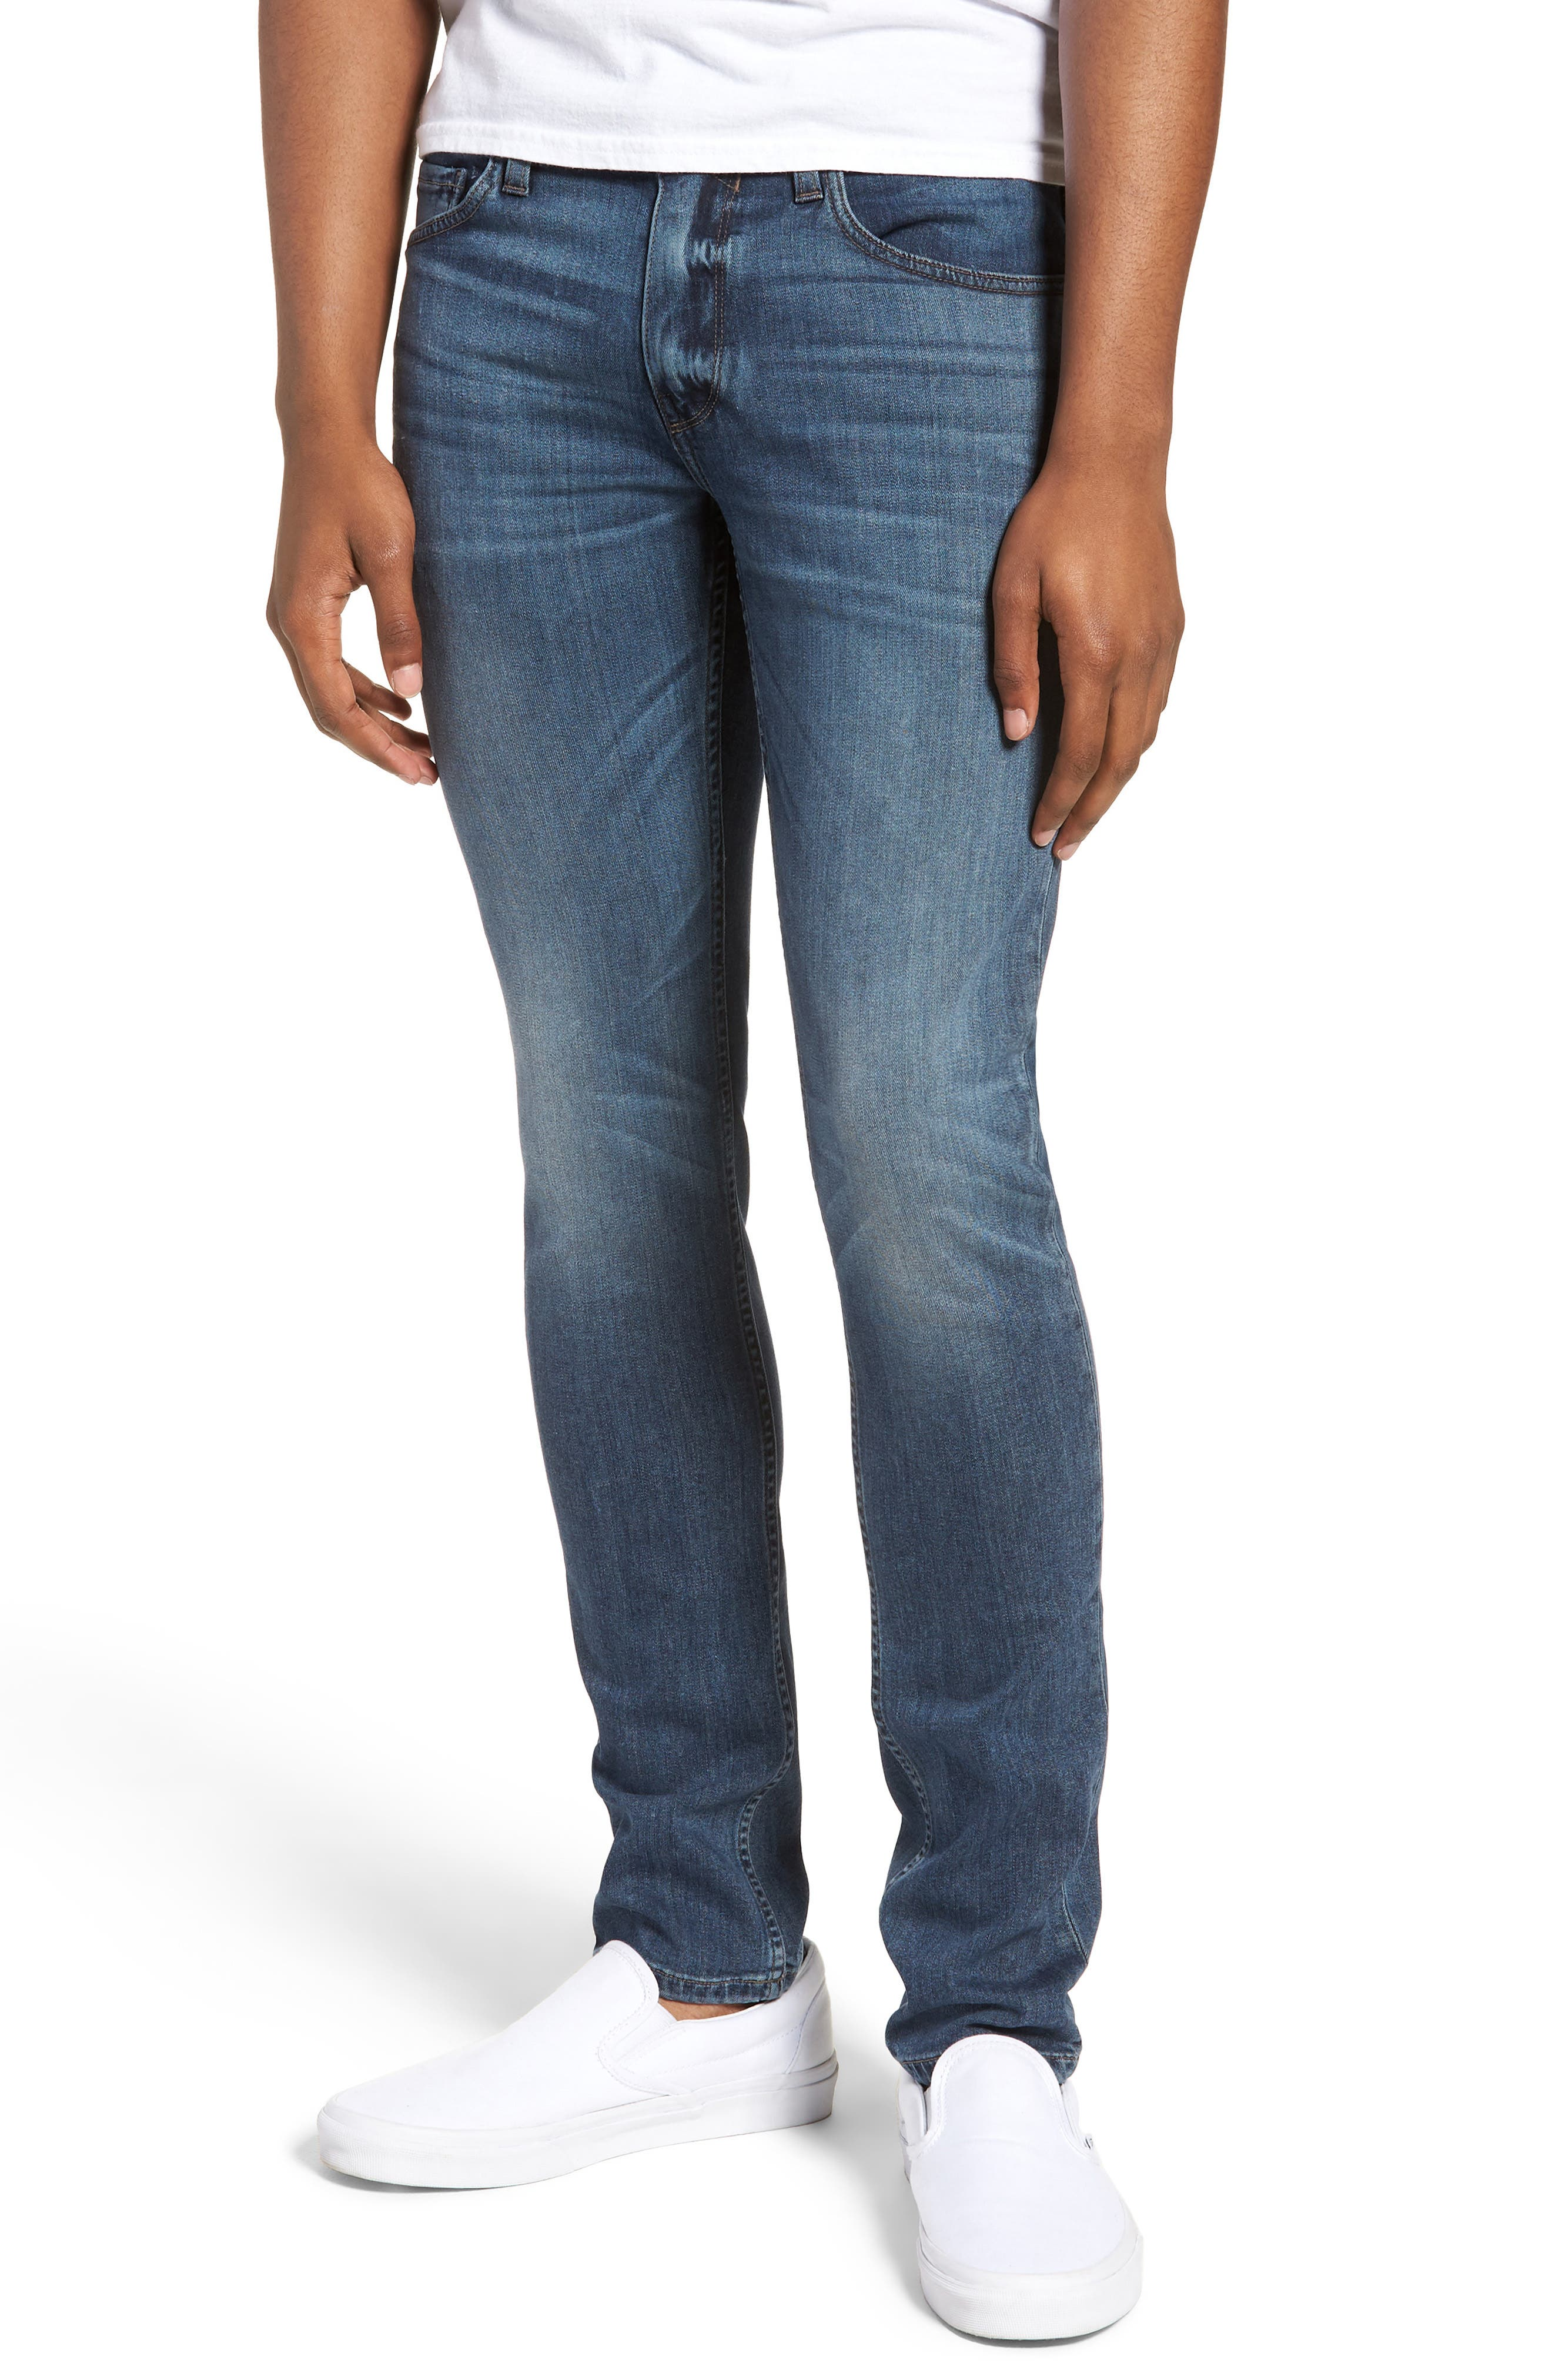 Transcend - Croft Skinny Fit Jeans,                         Main,                         color, GRAMMERCY